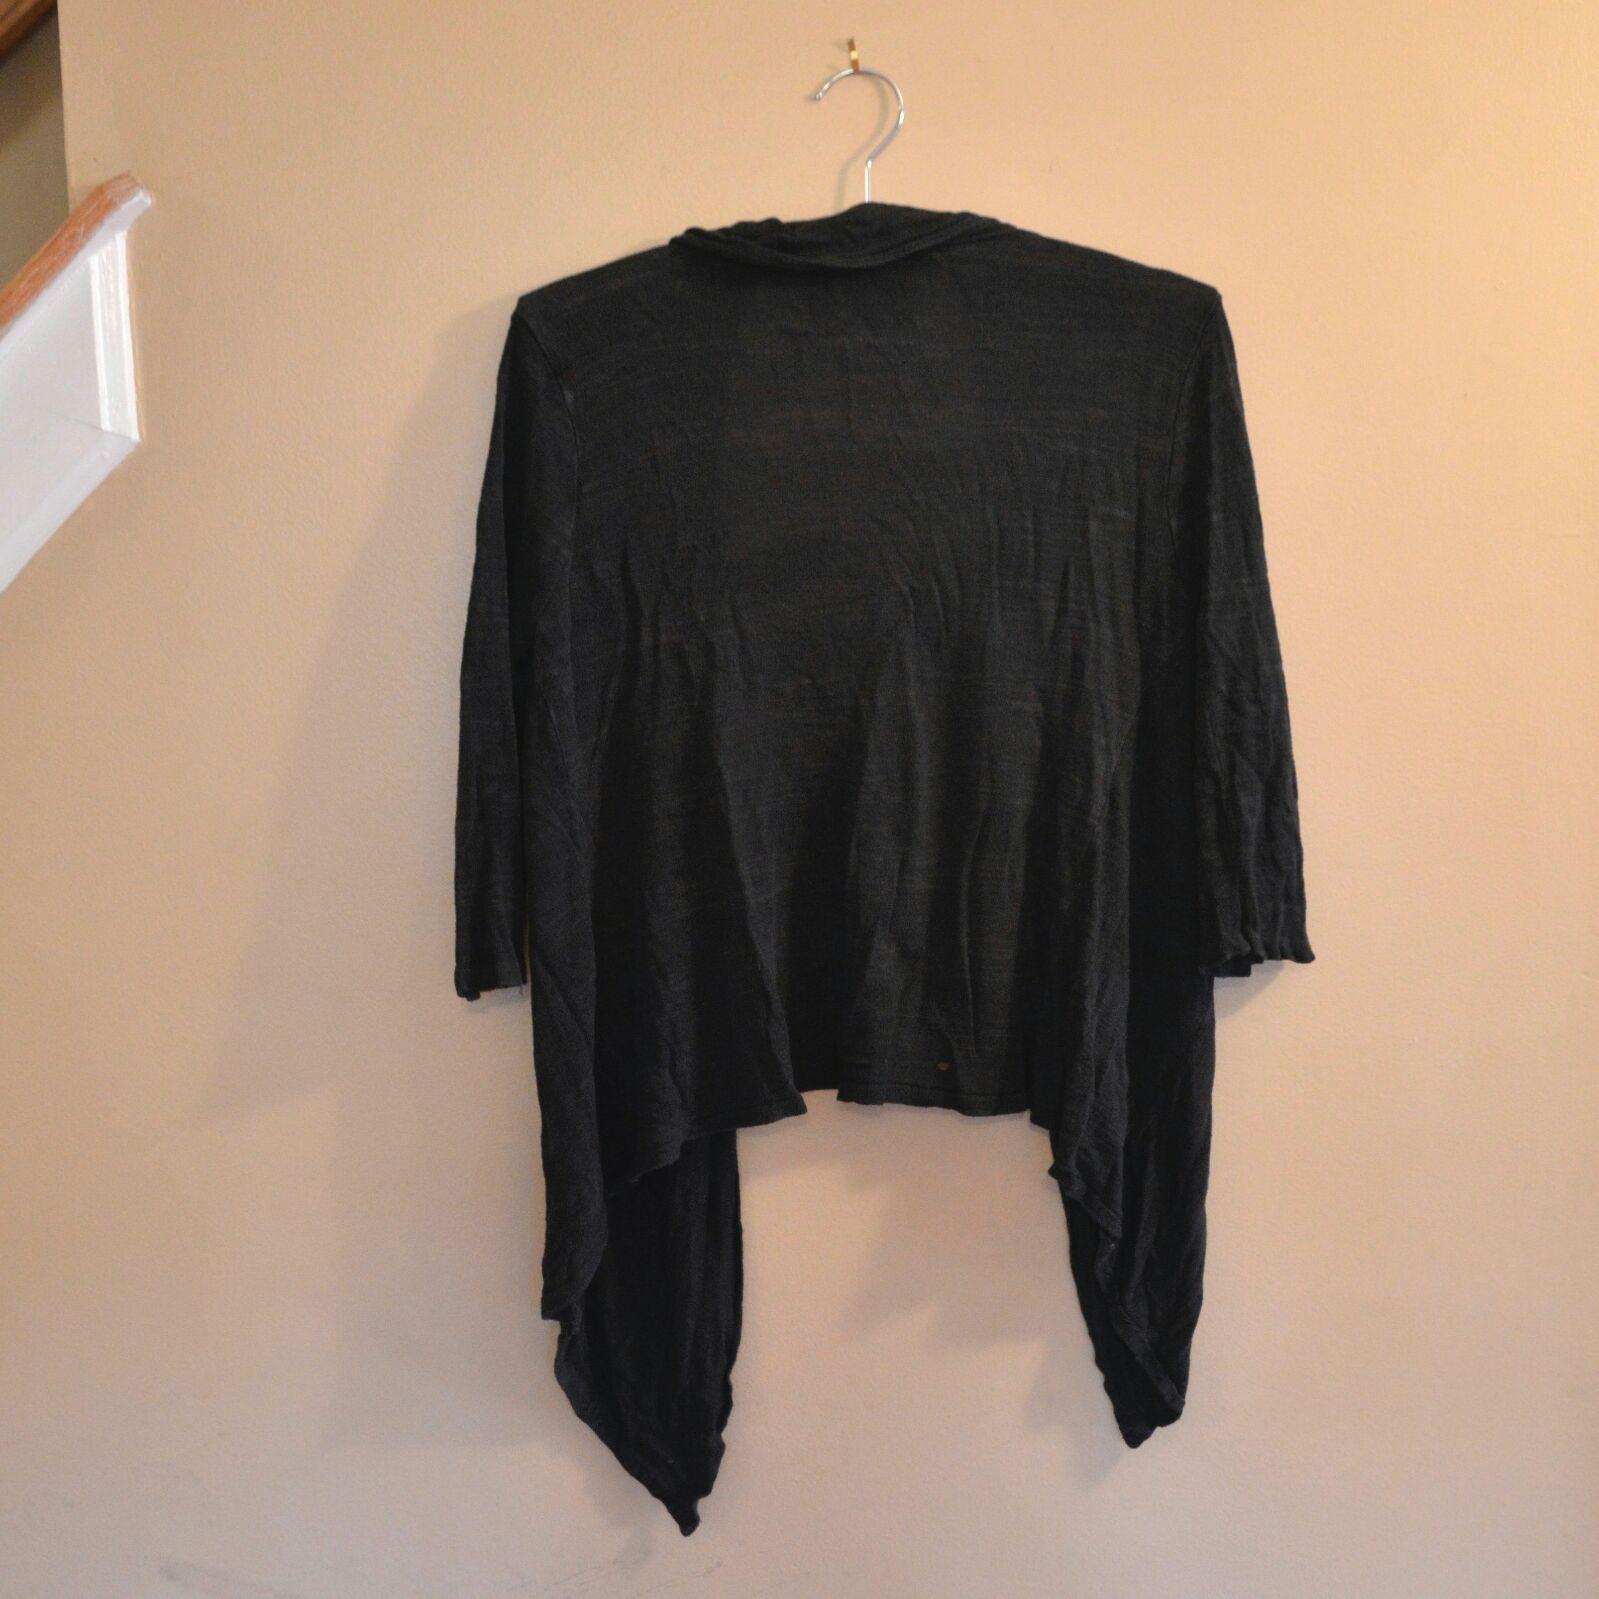 Basic Black Lightweight Blanket Cardigan - Mercari: BUY & SELL ...